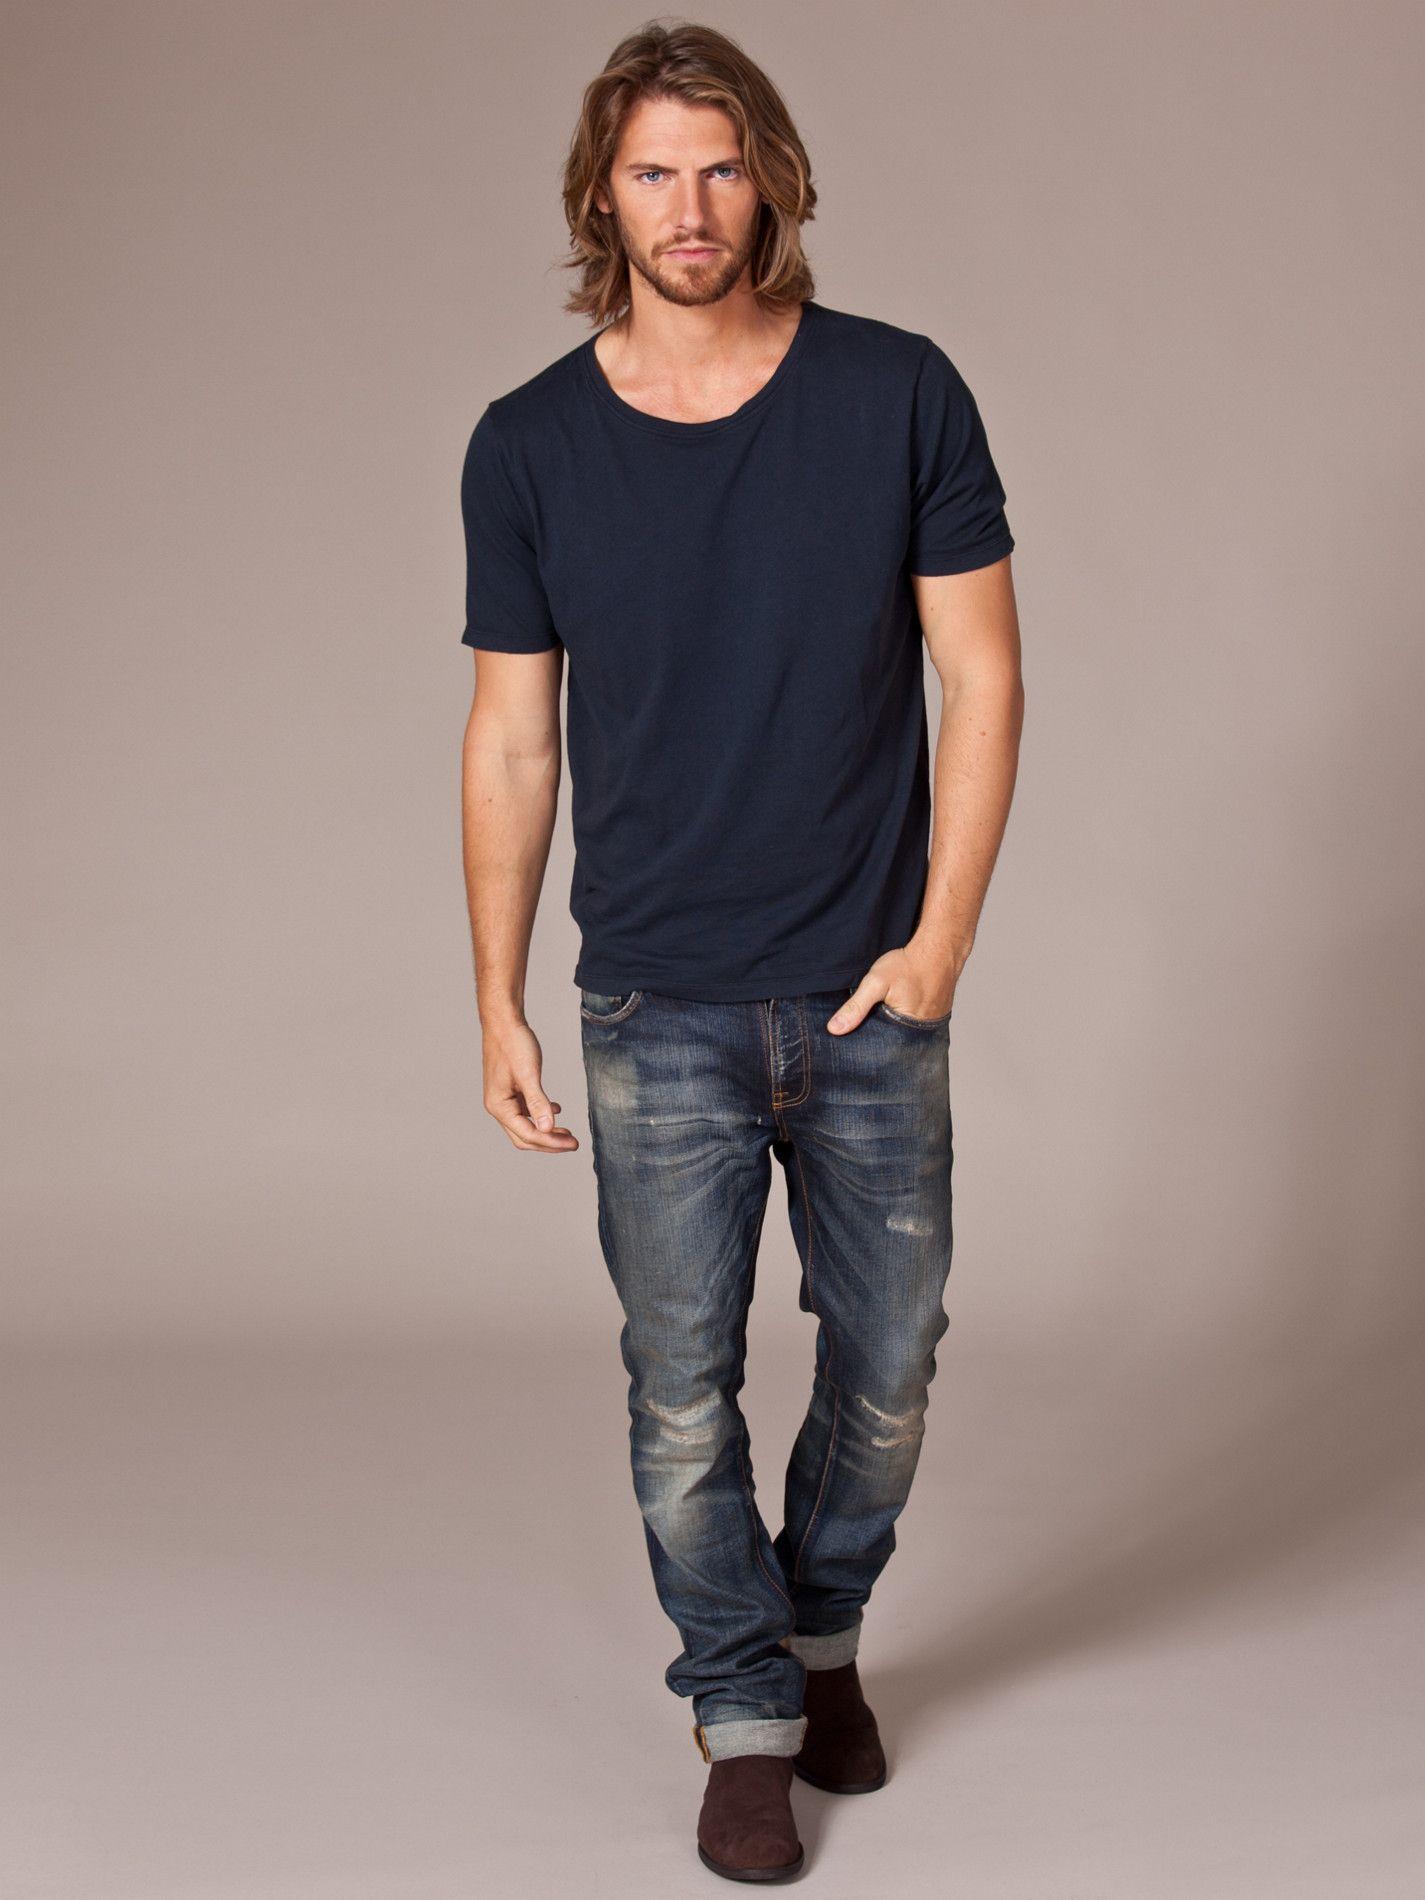 Wide Neck T Shirt Nudie Jeans Dark Blue T Shirts